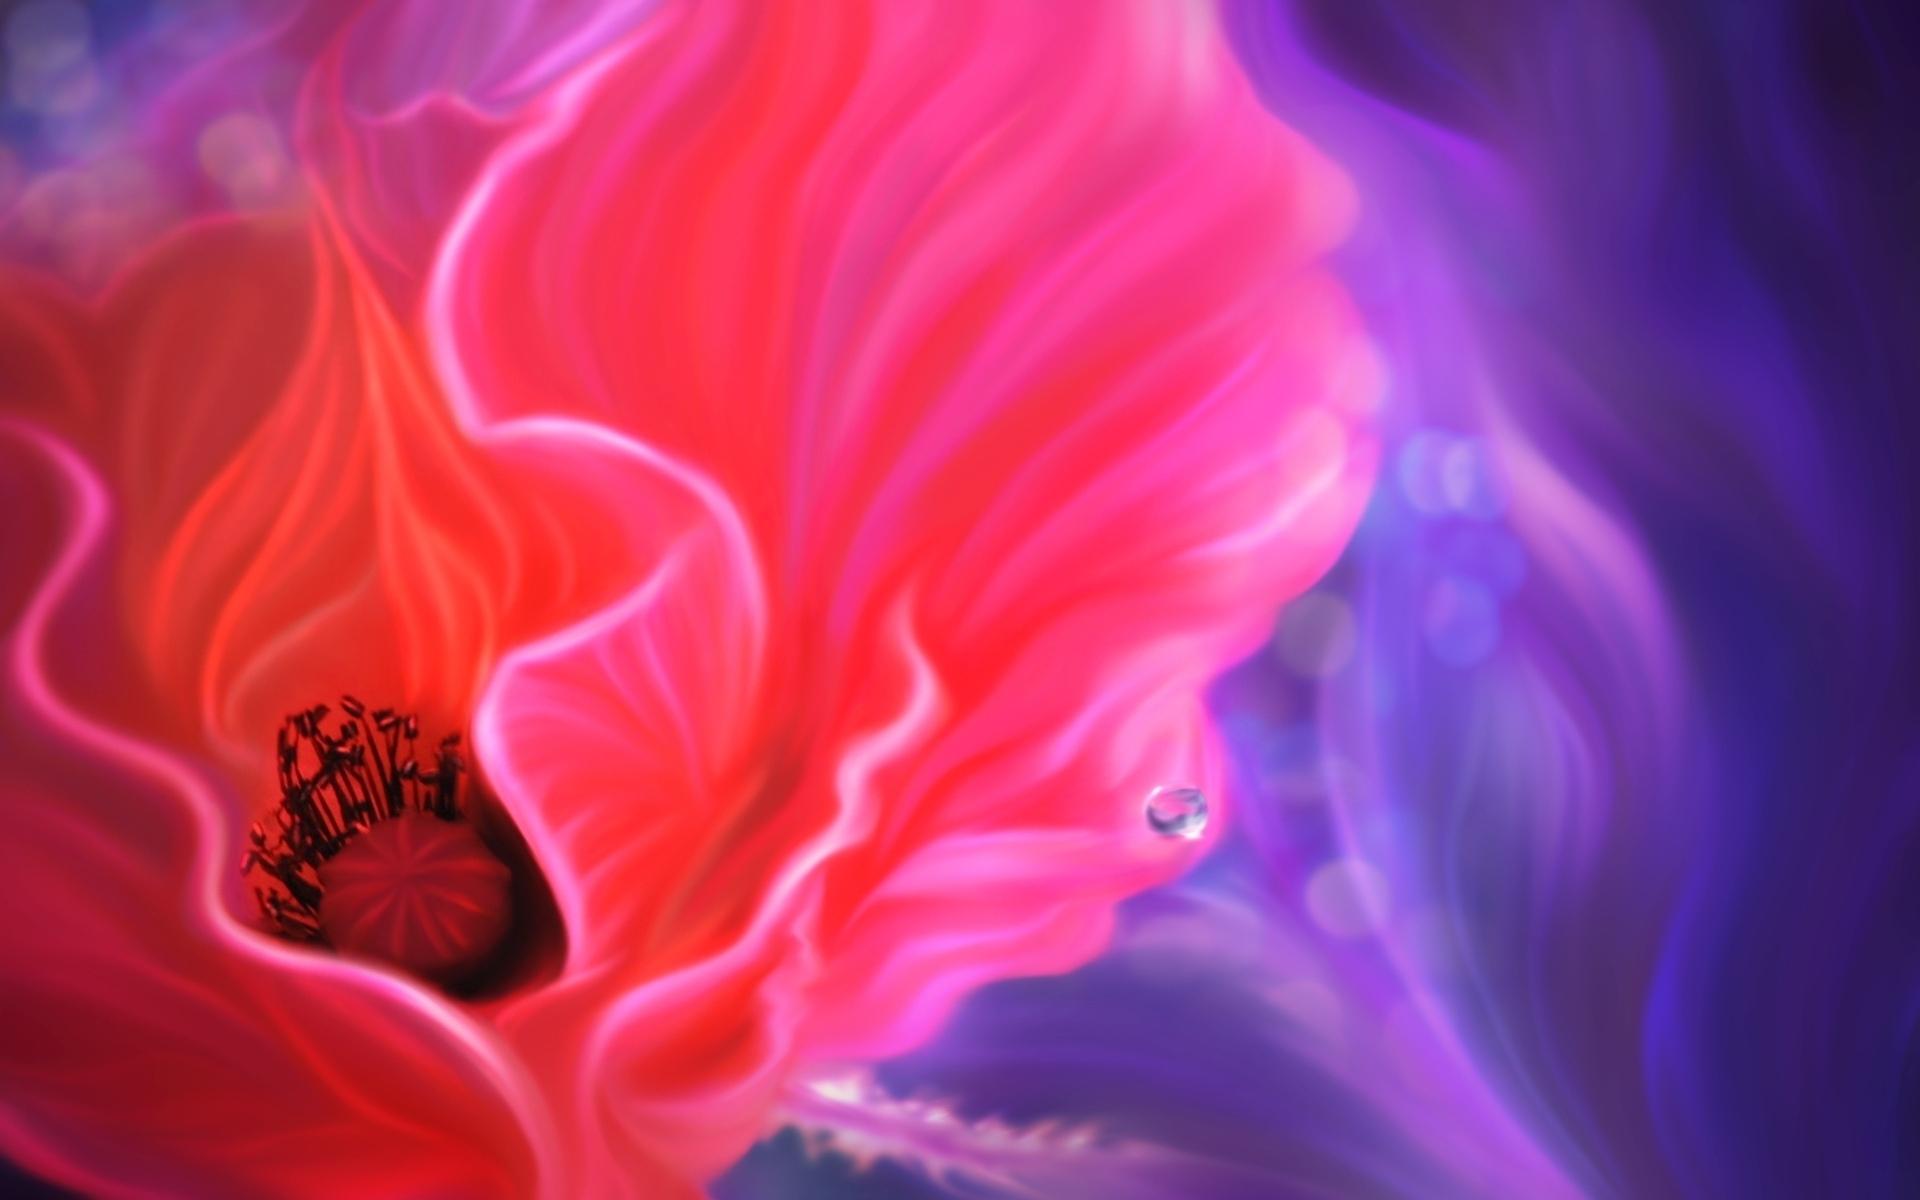 Poppy Wallpaper For Iphone Poppy Wallpaper Magnificent Hd Desktop Wallpapers 4k Hd